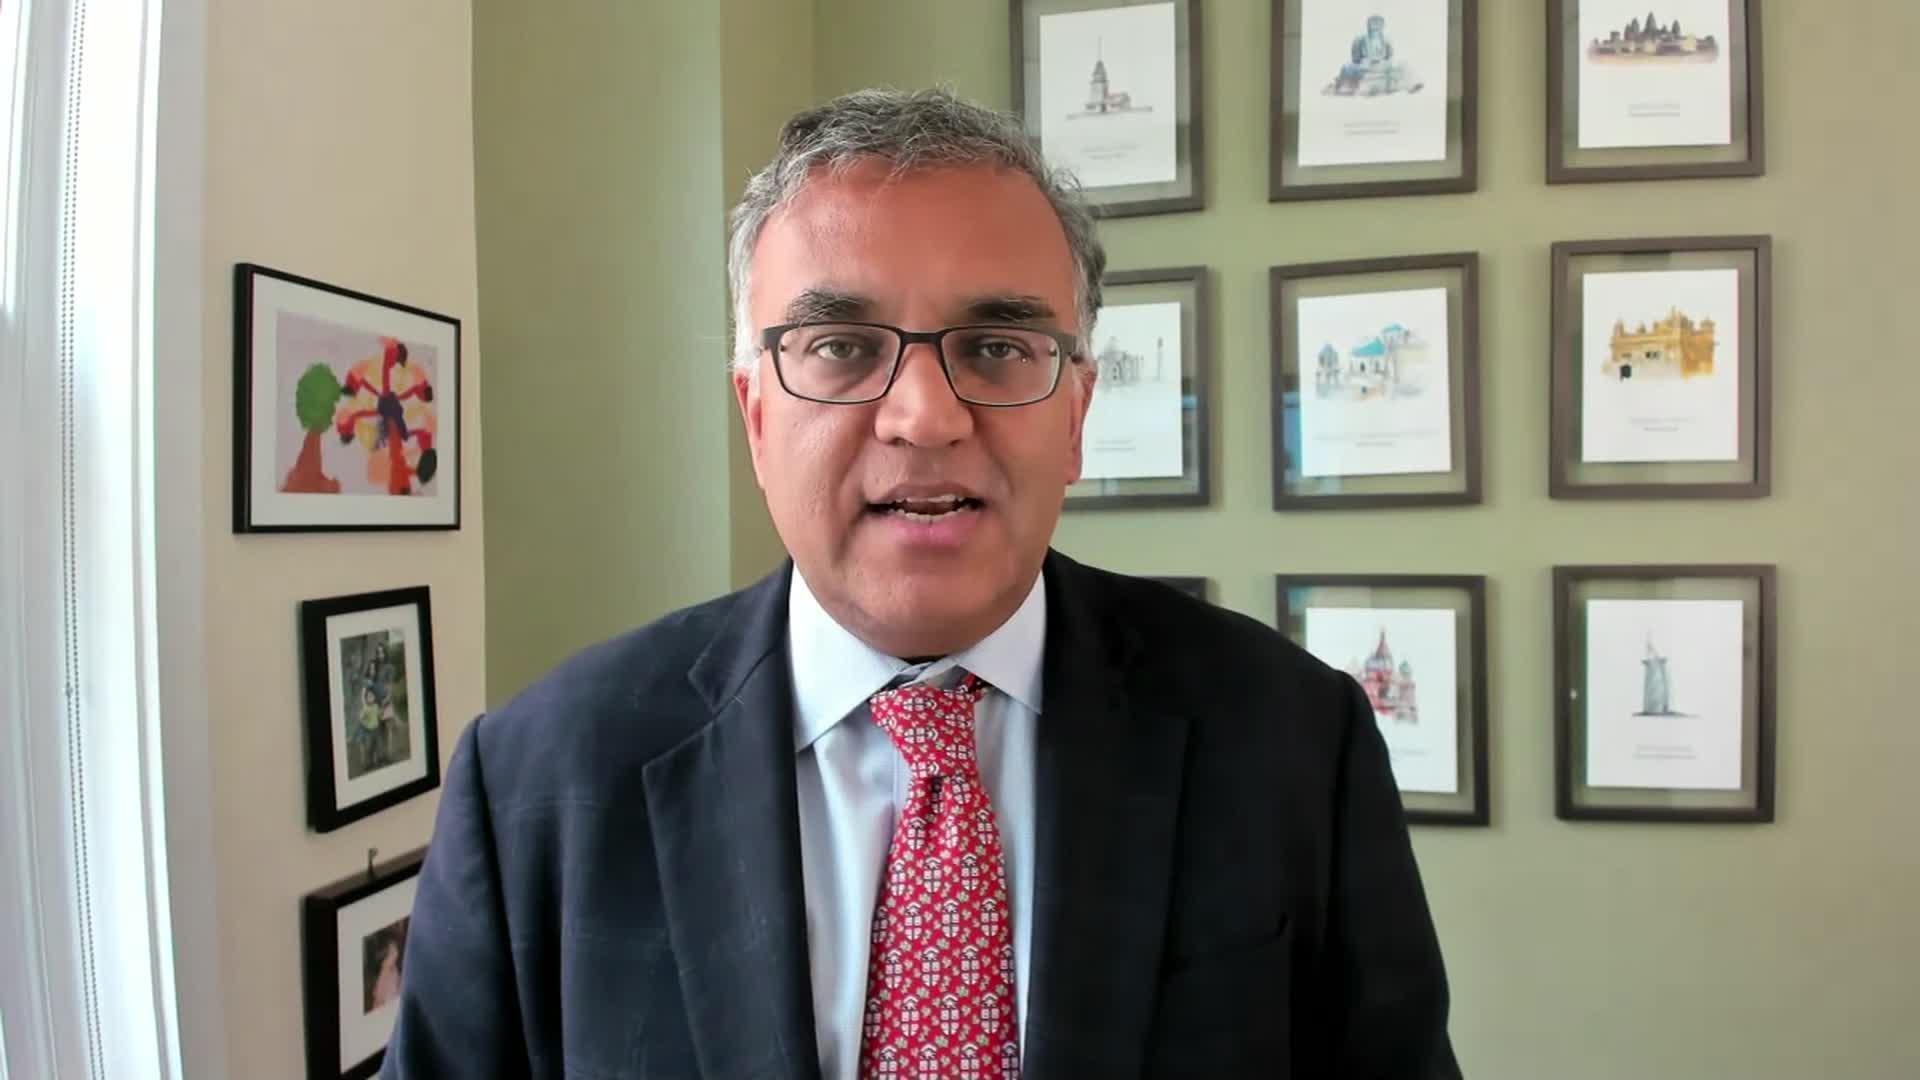 Public health expert Dr. Ashish Jha.